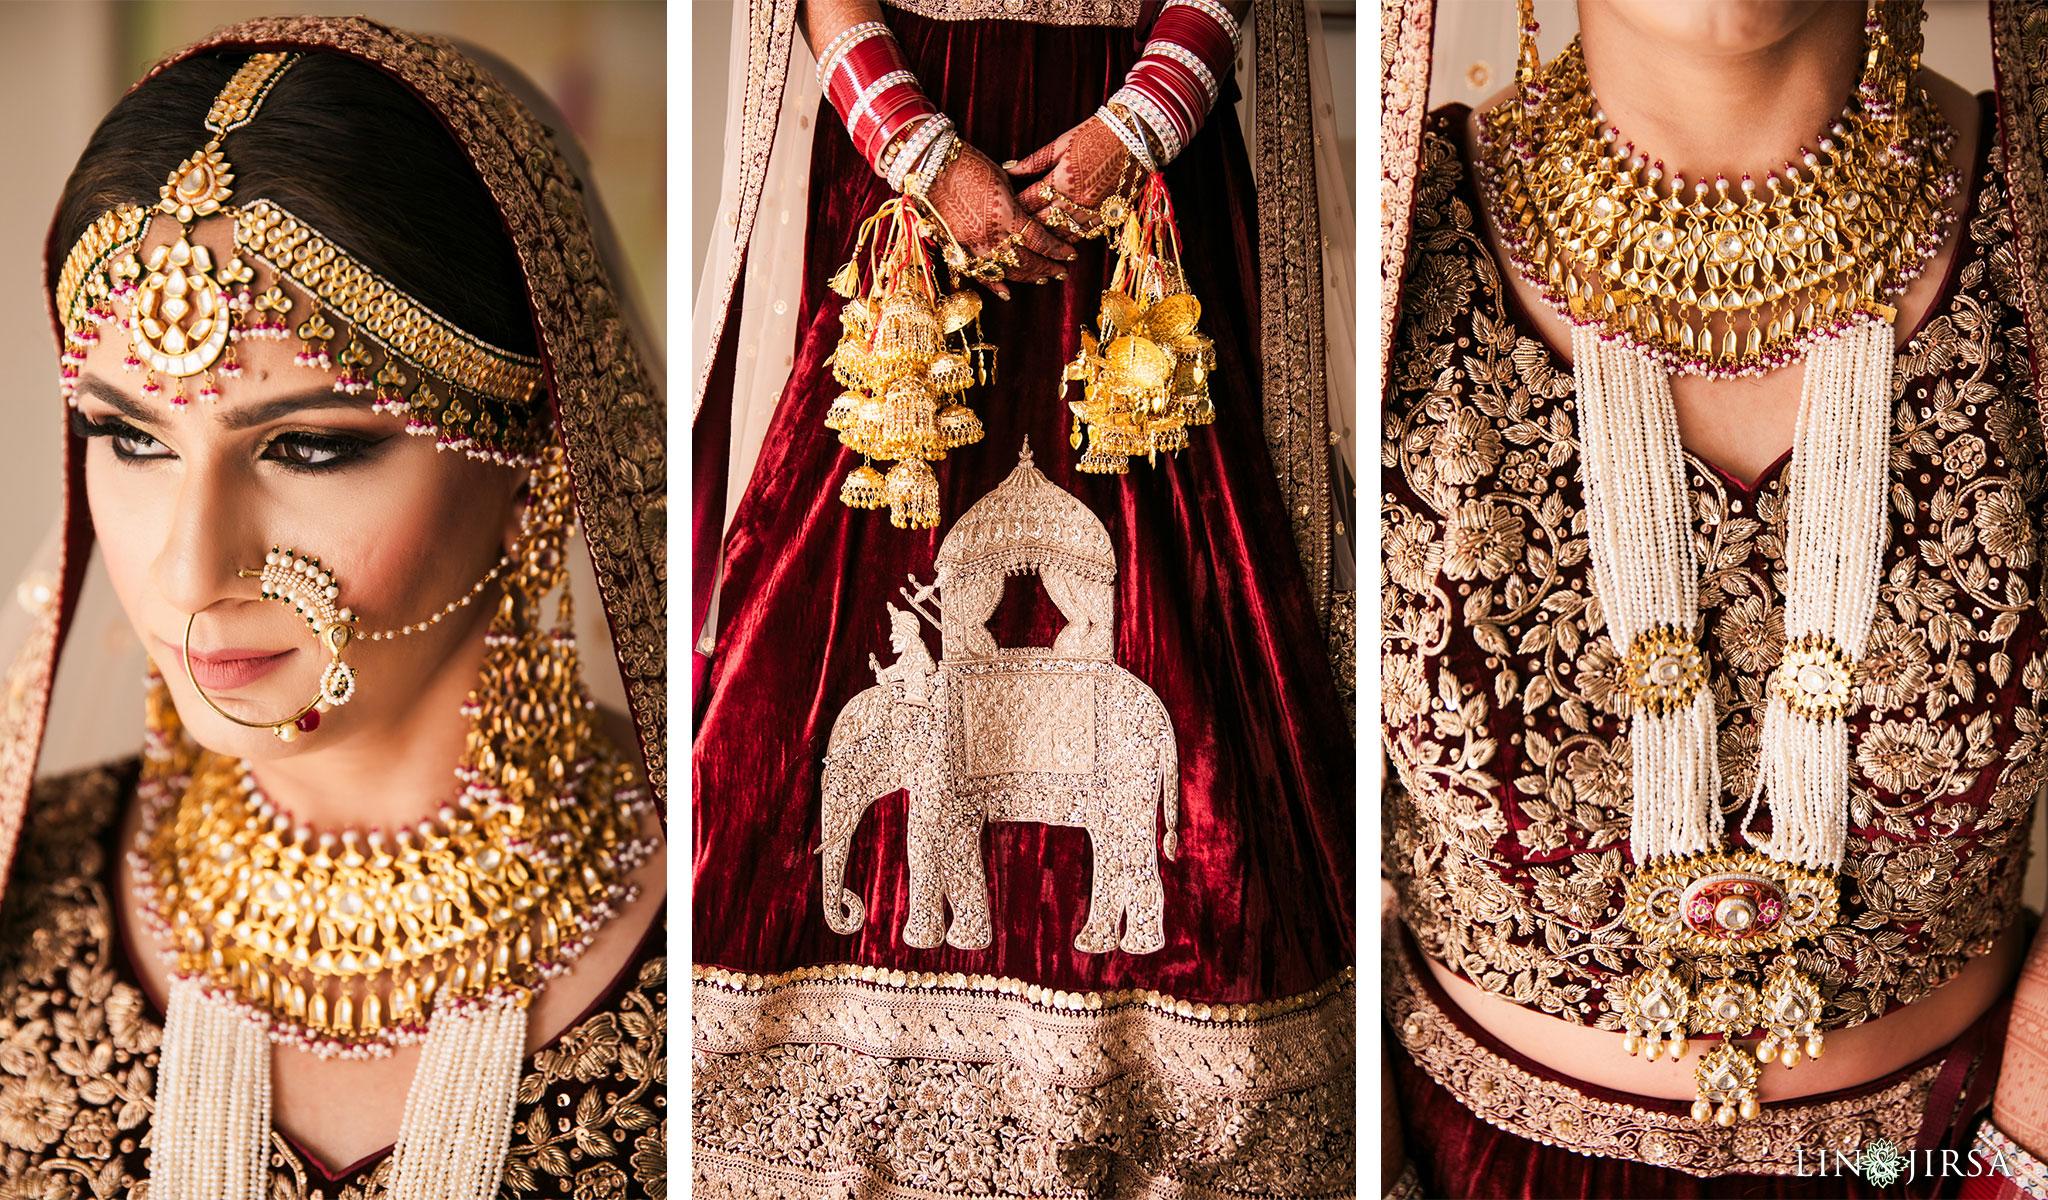 005 monarch beach resort dana point indian bride wedding photography